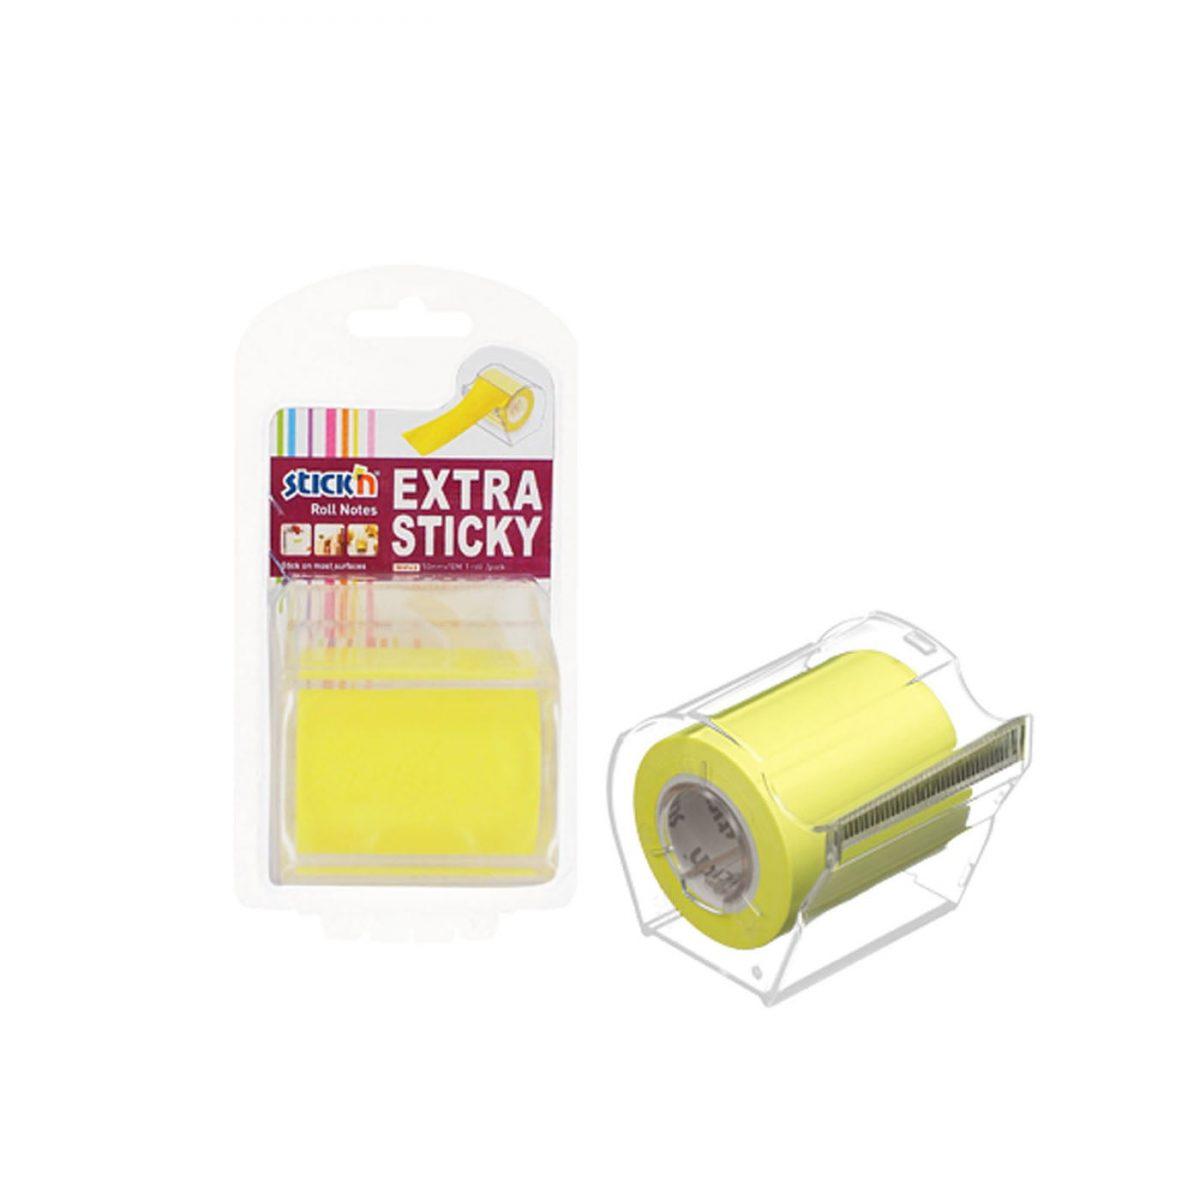 "Notes autoadeziv in rola, cu dispenser, 50 mm x 10 m, Stick""n - galben neon"